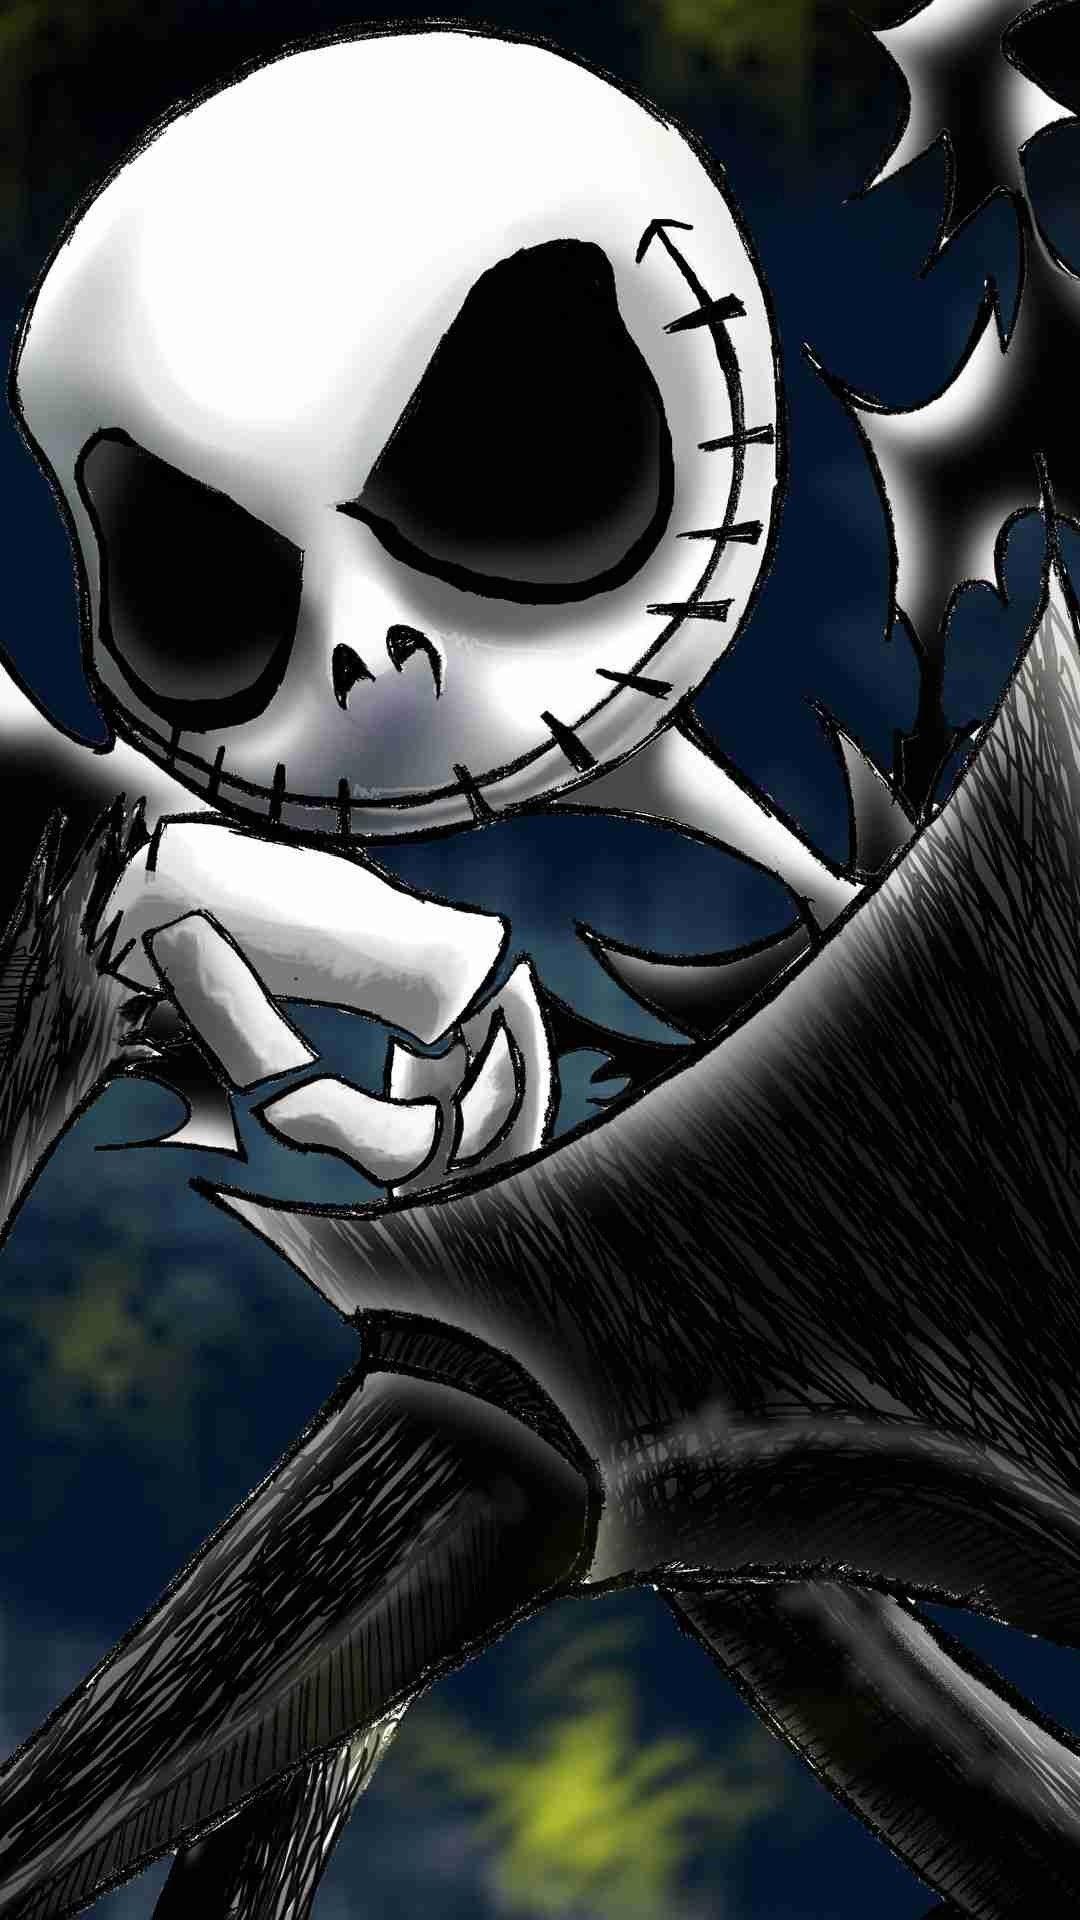 2014 Halloween Jack Skellington iPhone 6 Wallpaper - Insipired Nightmare Before Christmas #2014 ...